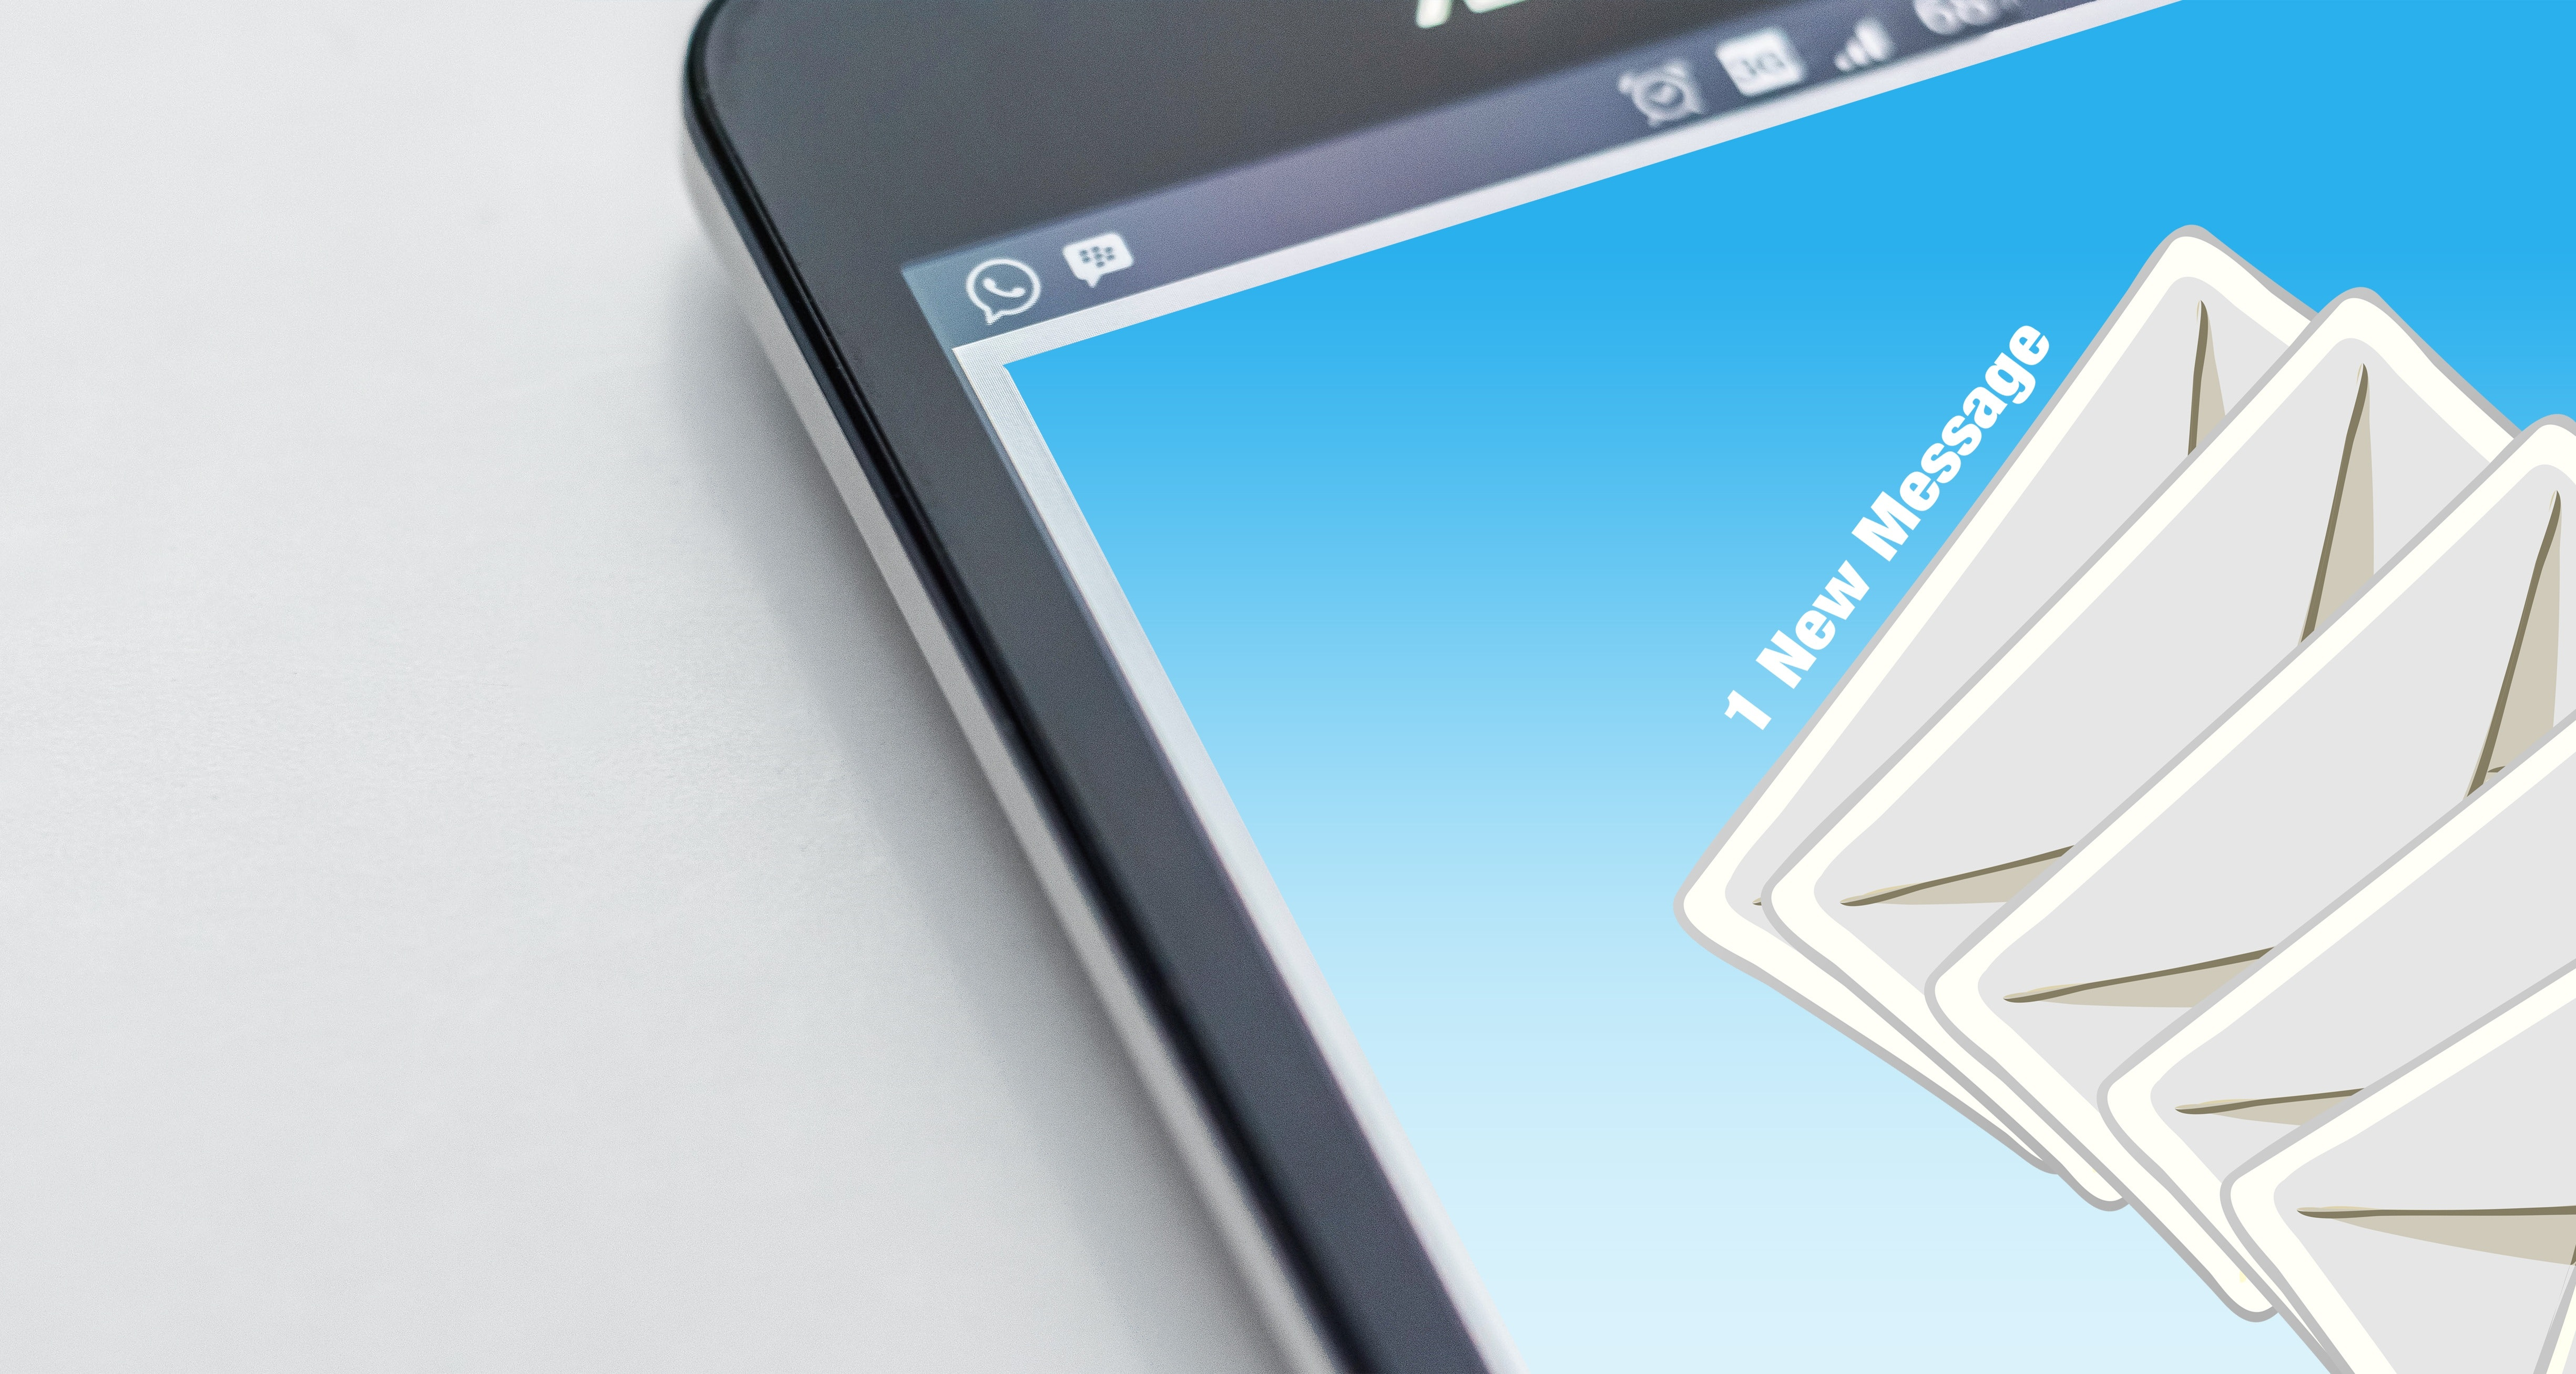 HMRC scam emails; HMRC text messages; HMRC; tax refunds